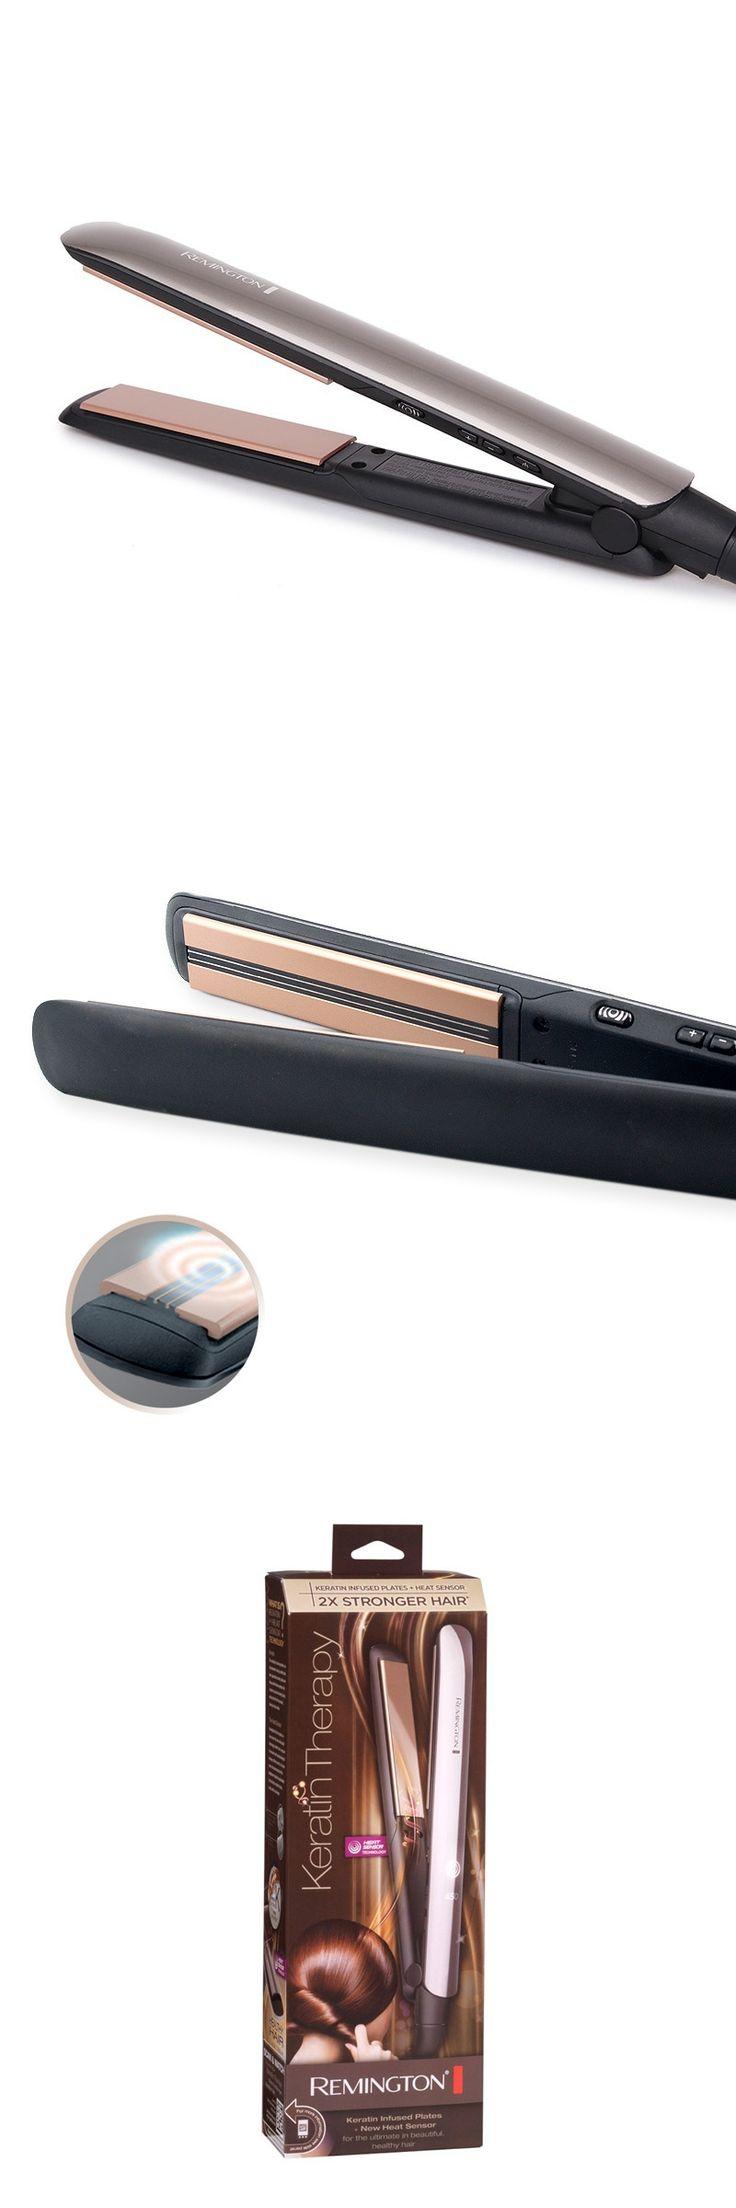 Good Quality Professional Remington Hair Straightener S8590 Keratin Therapy Digital Straightener With Smart Sensor EU US Plug